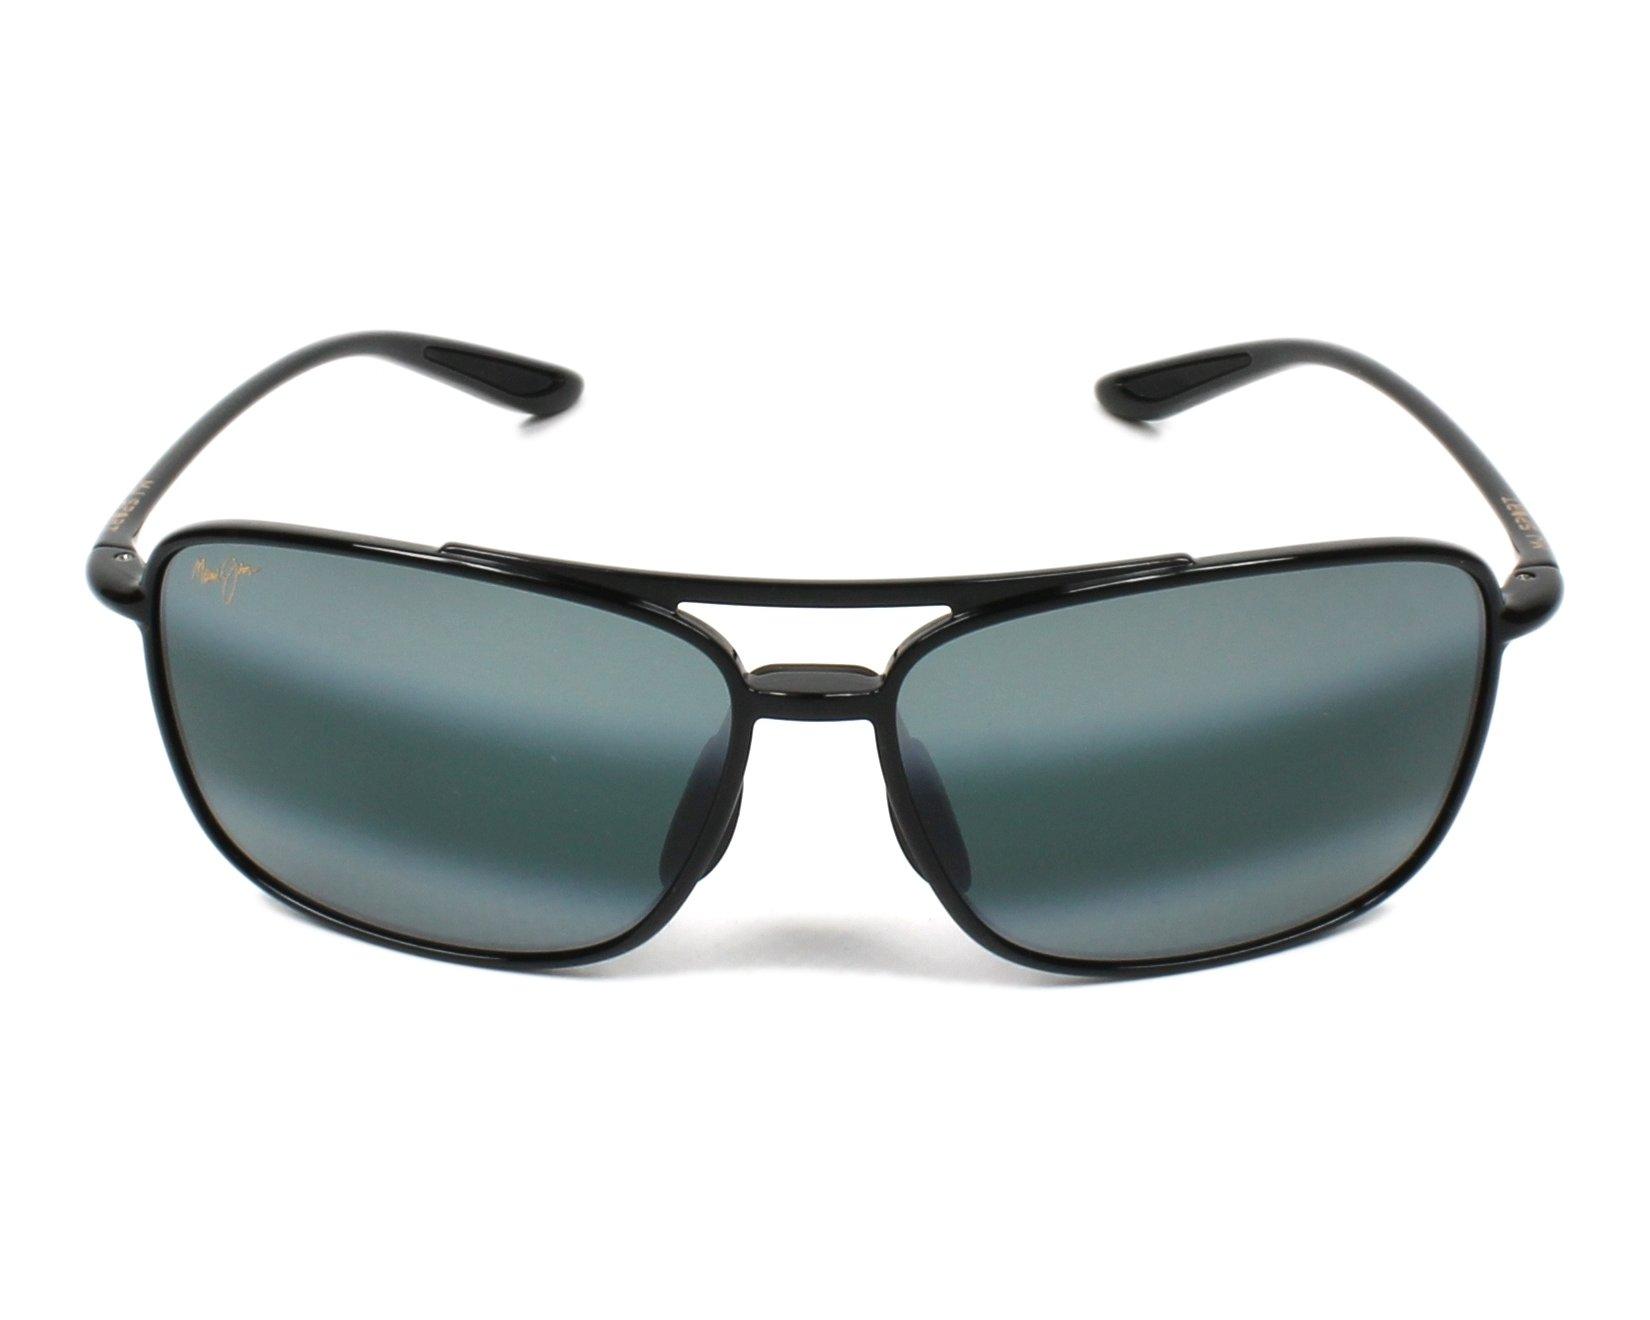 0380fb5cc755 Sunglasses Maui Jim 437 02 61-15 Black front view